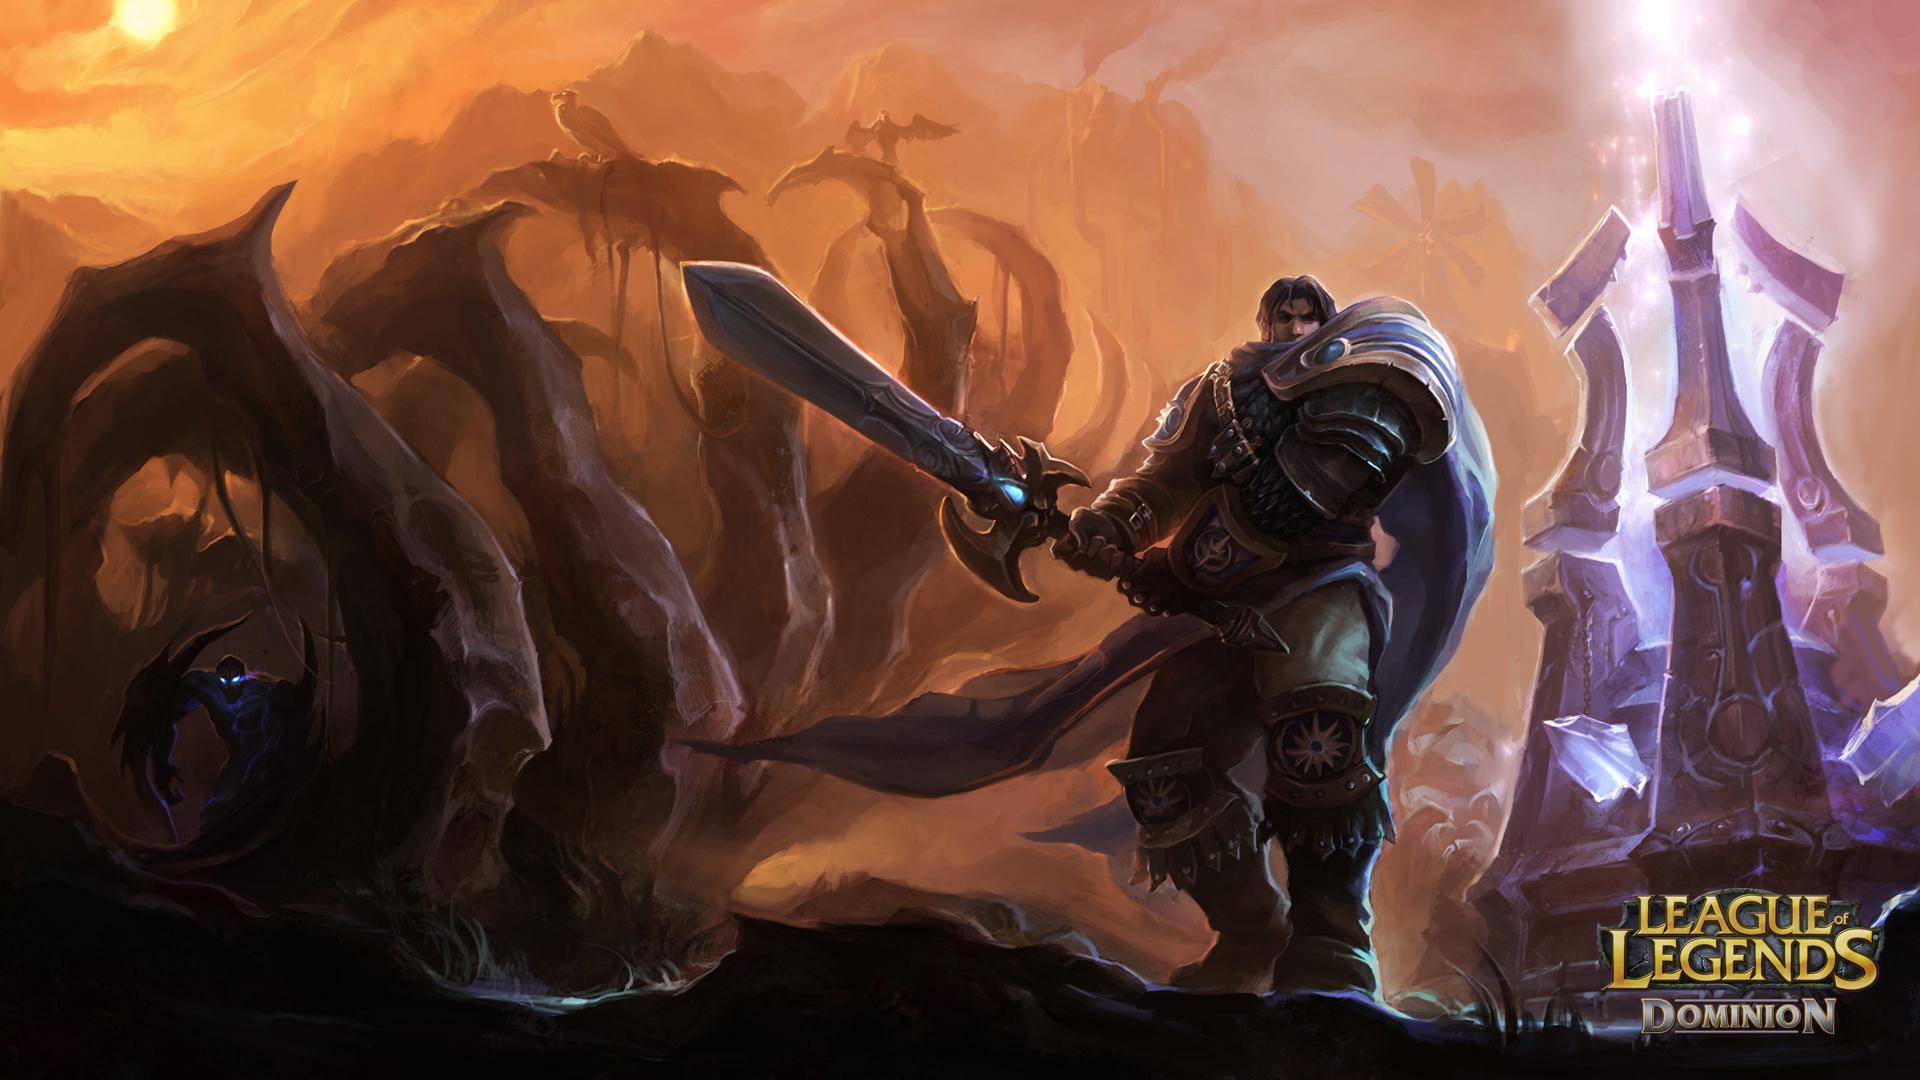 League of Legends wallpaper 11